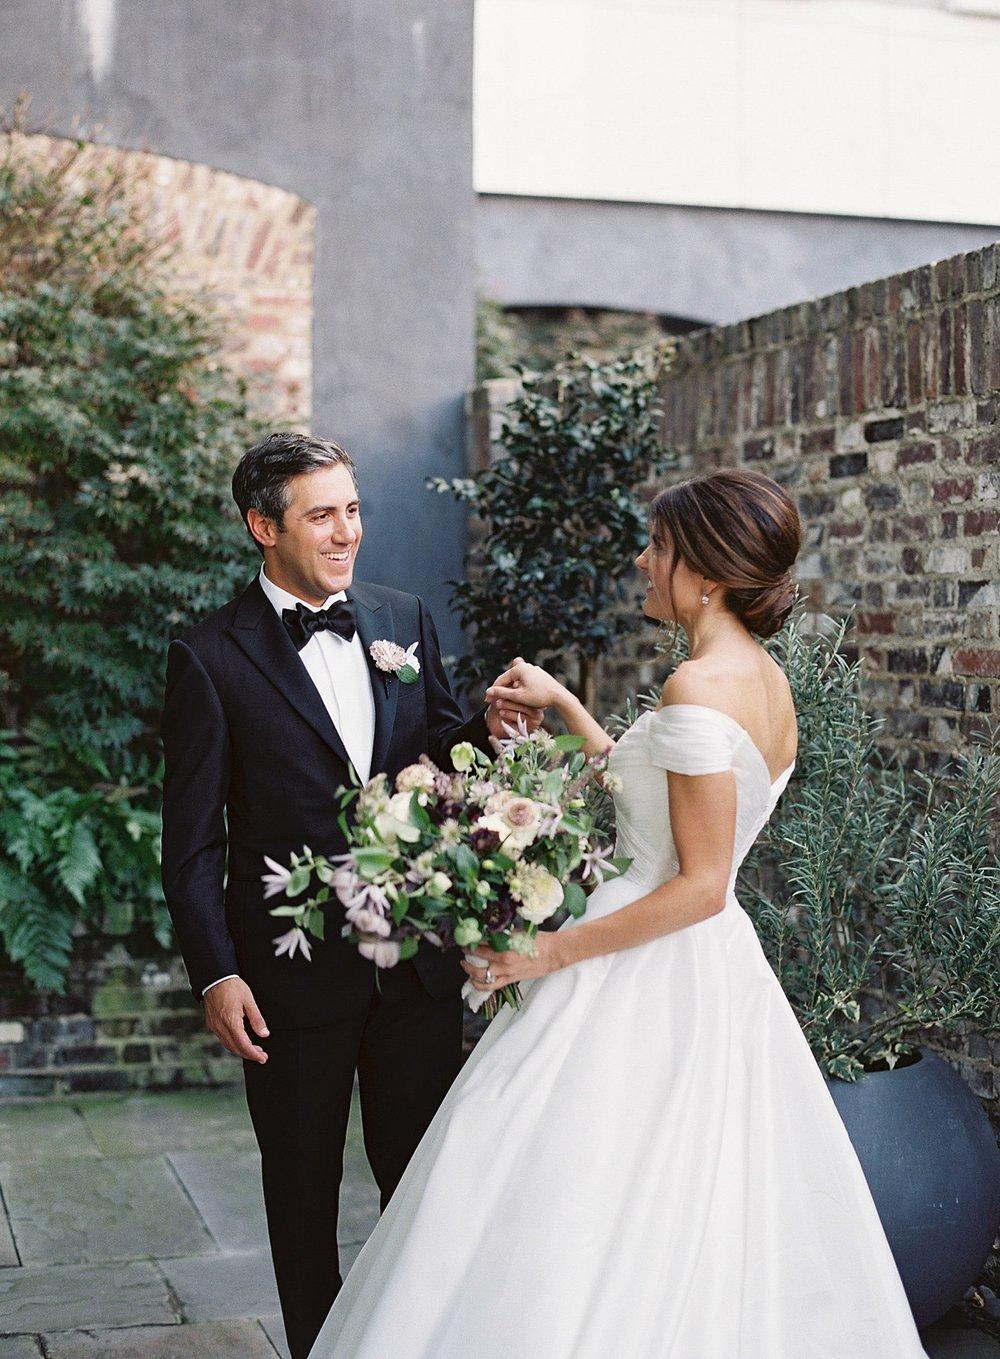 8_dewberry_charleston_wedding.jpg